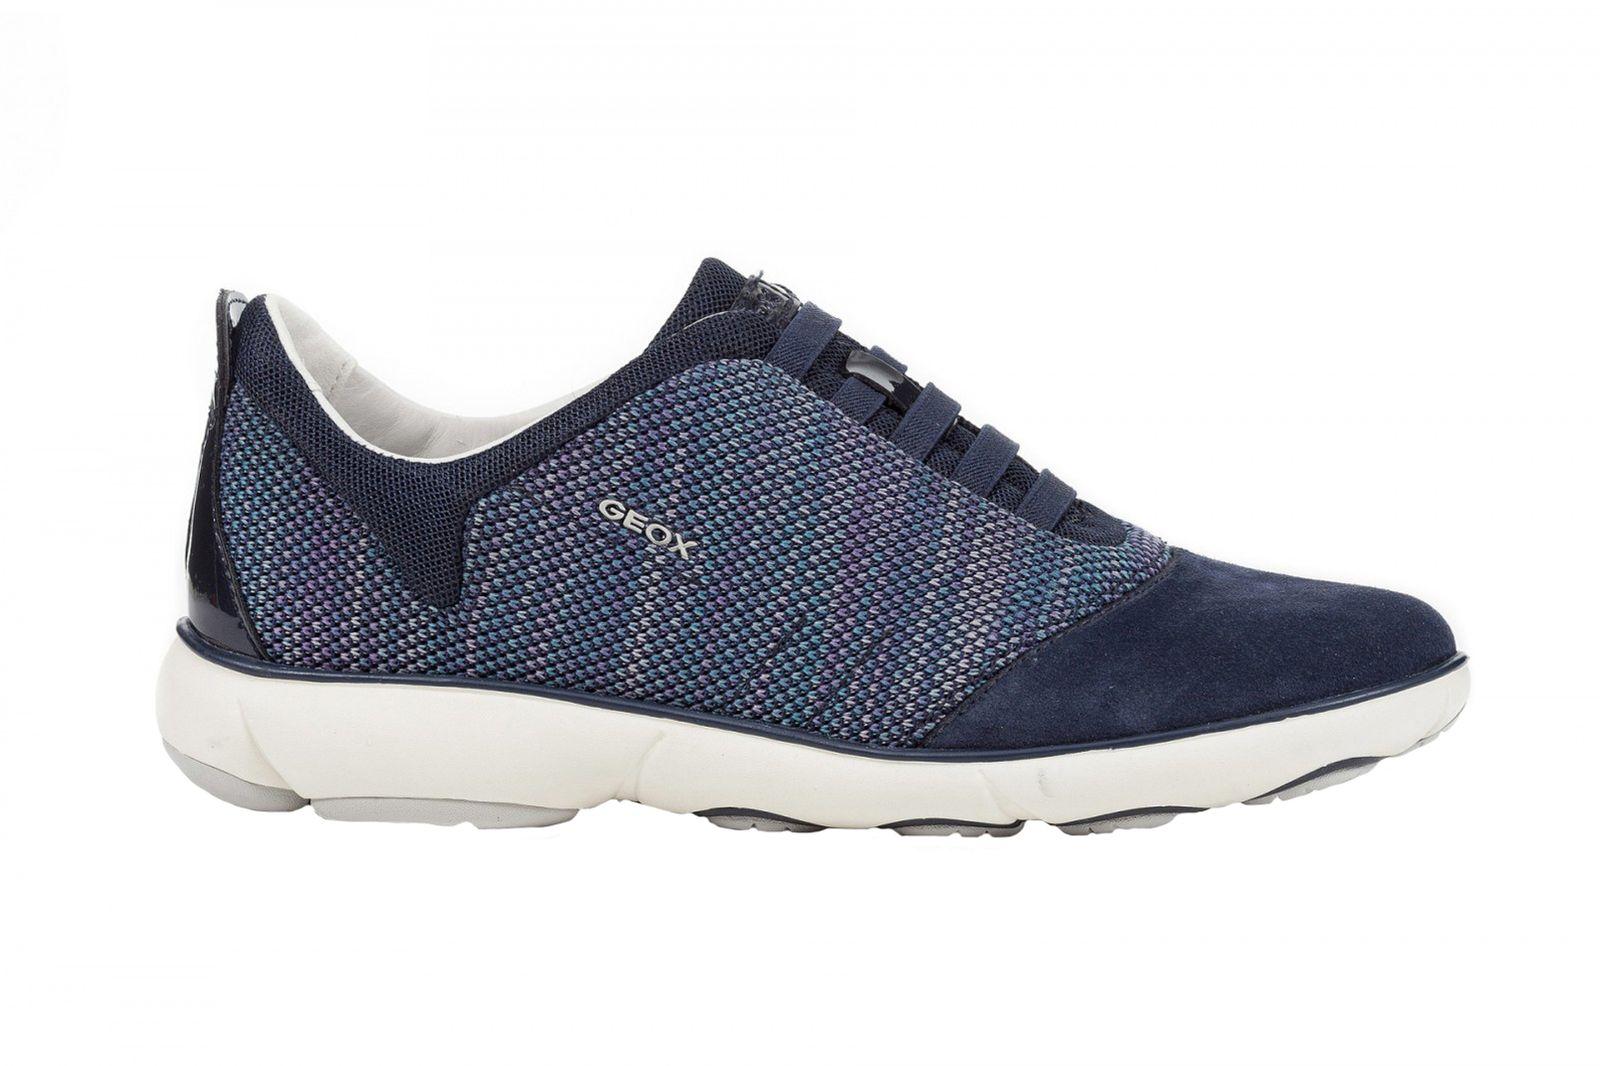 GEOX Damen Sneaker NEBULA D621EC-C4002 navy blau